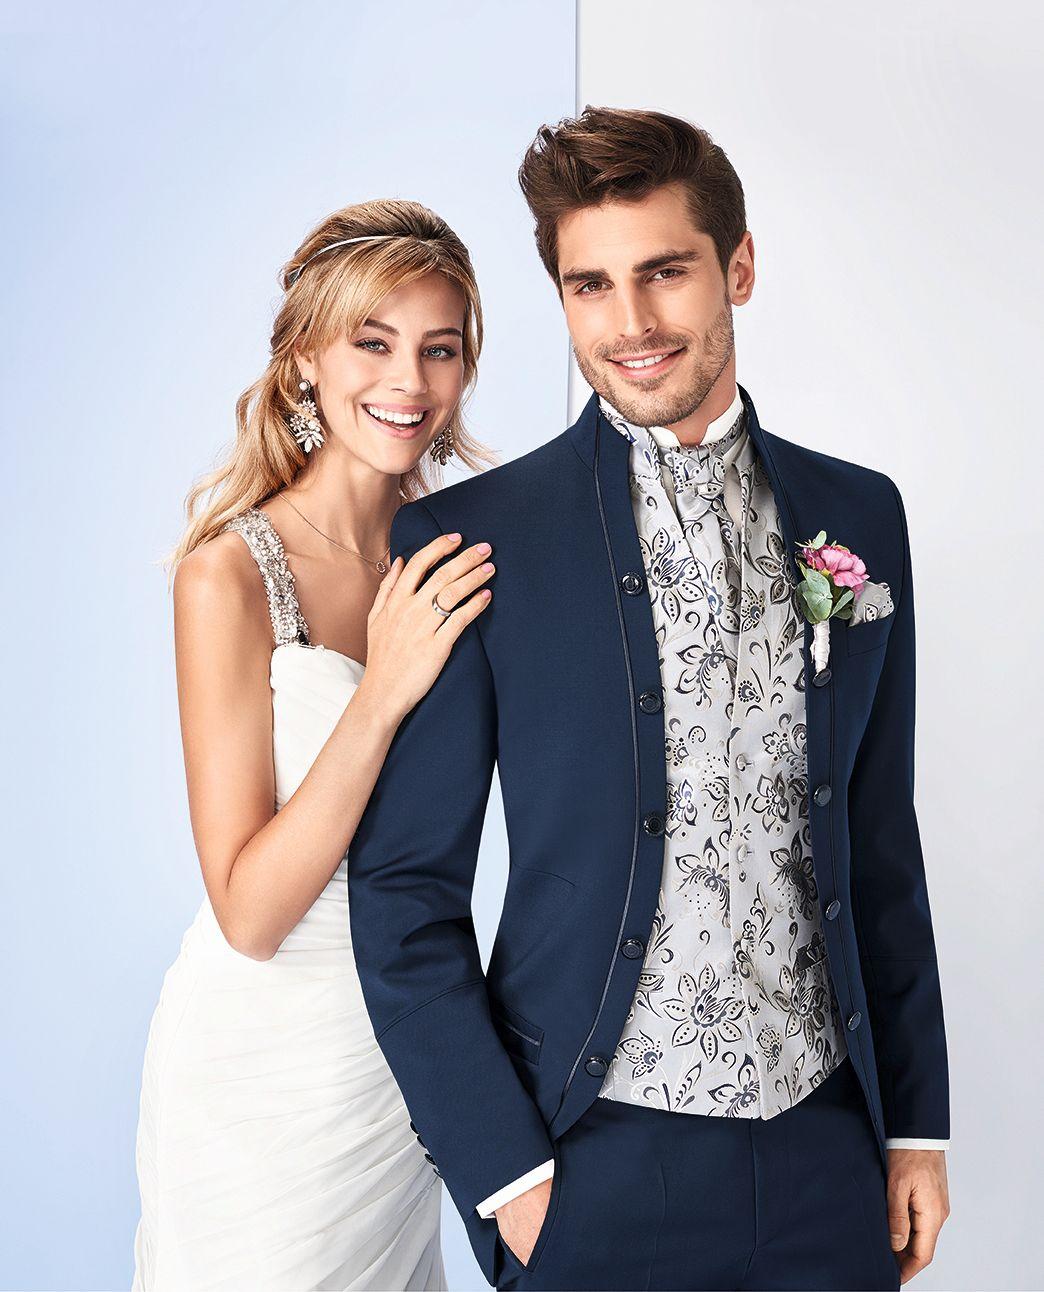 0394833c3 Modne garnitury ślubne Tziacco 2018 - Dyplomata